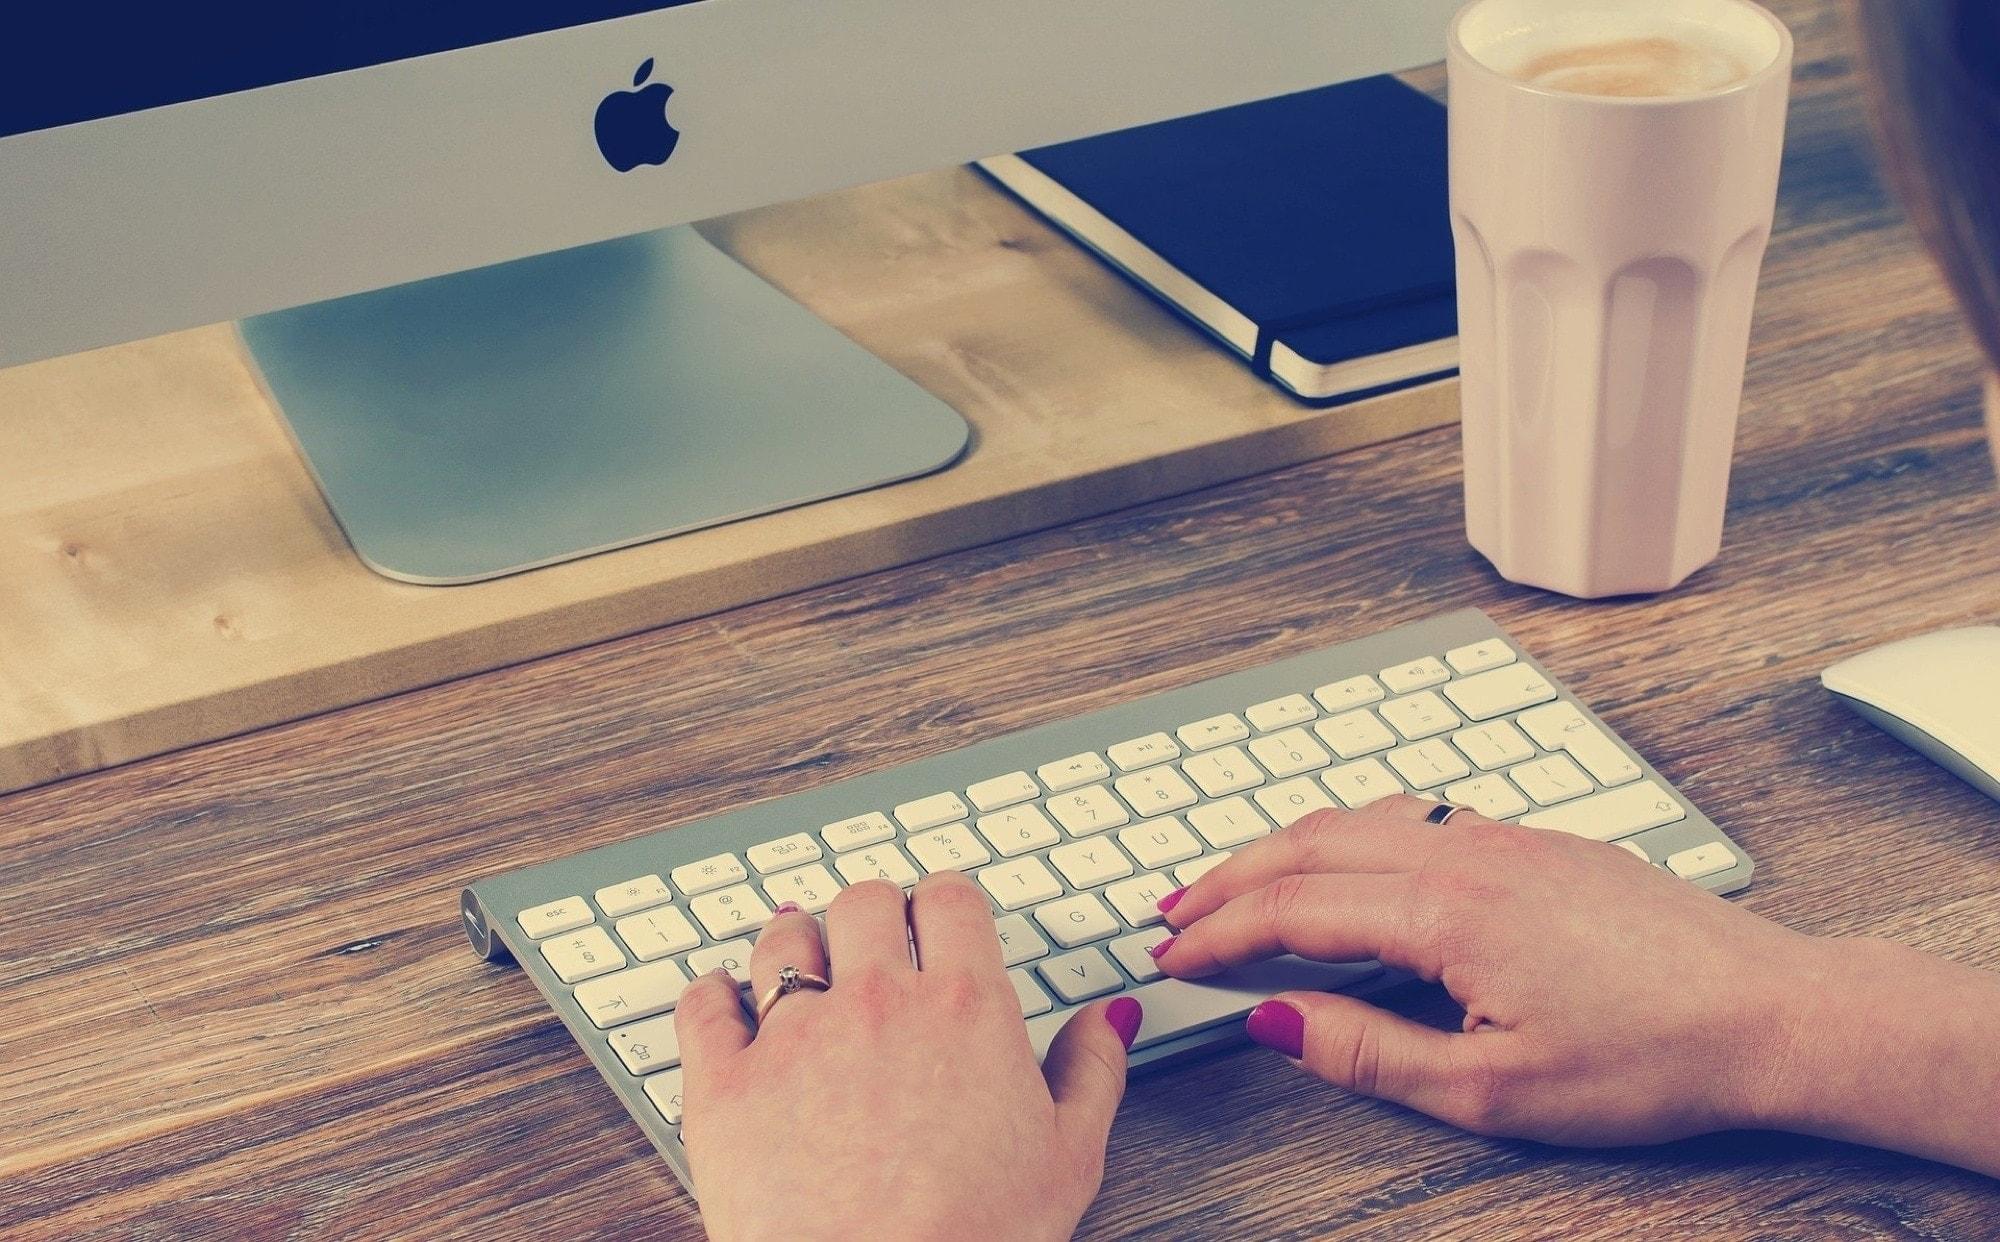 iMac keyboard - Messages keyboard shortcuts